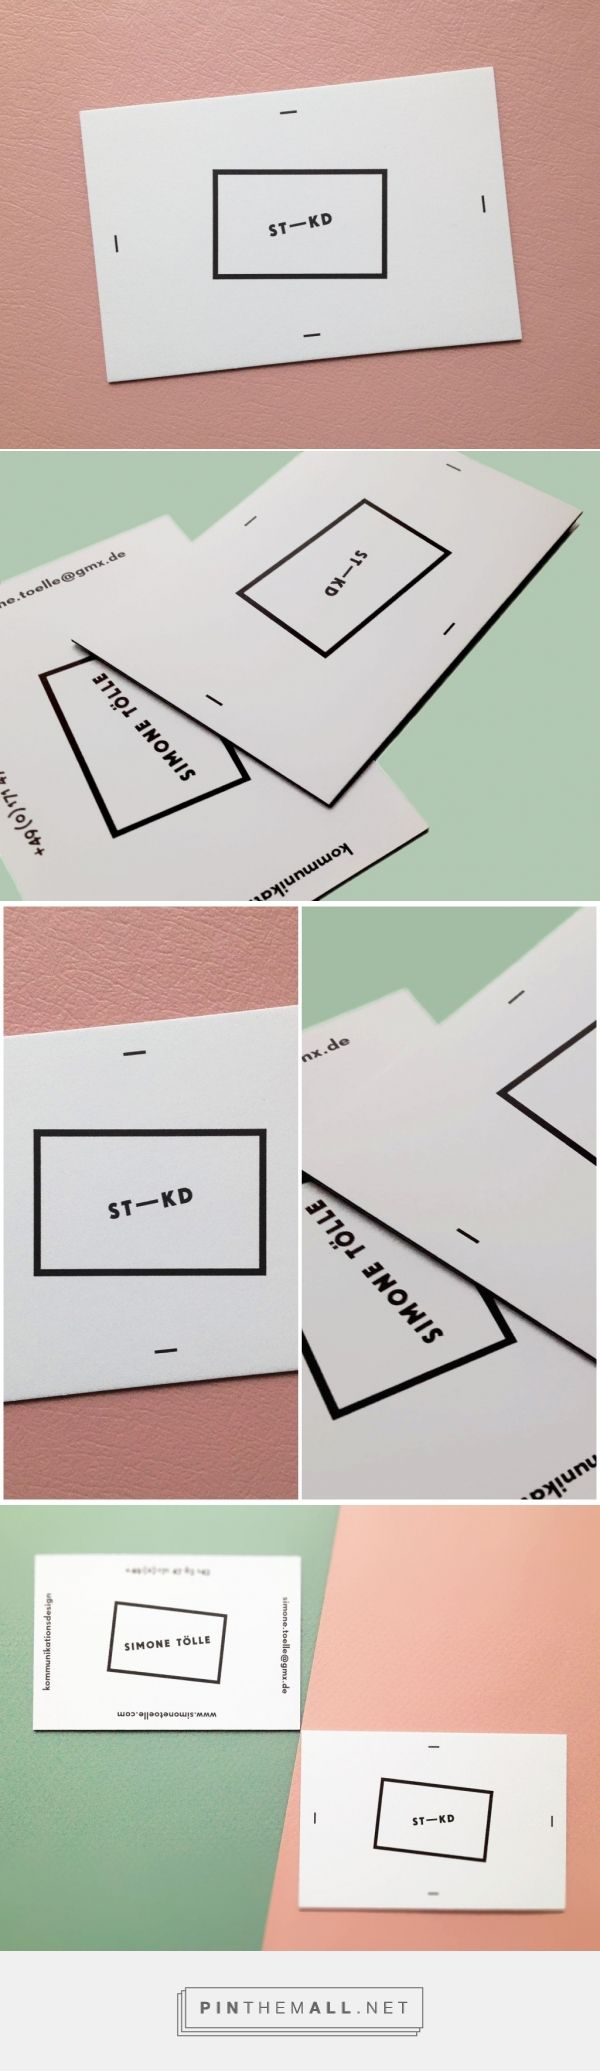 best branding portfolio images on pinterest graphics graph